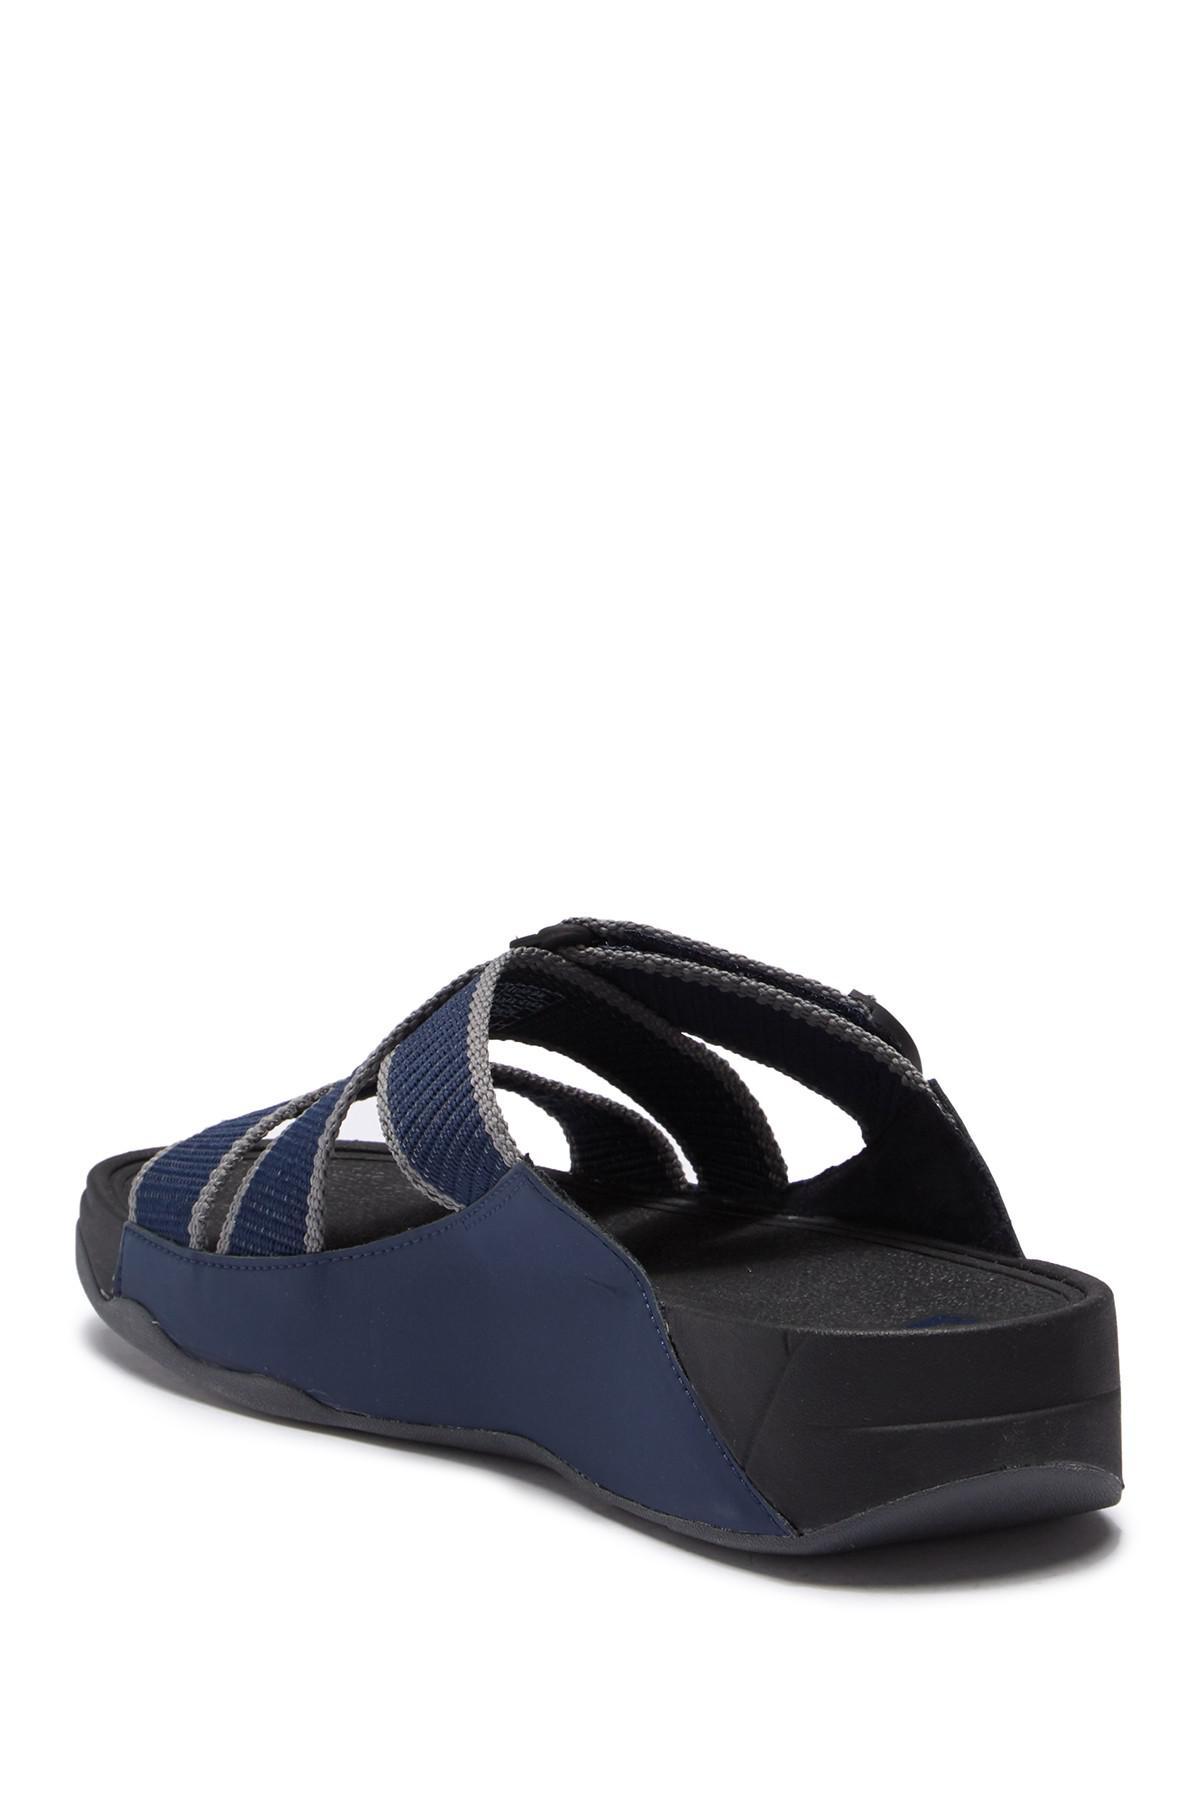 9bca87f19c60 Lyst - Fitflop Sling Ii Slide Sandal in Blue for Men